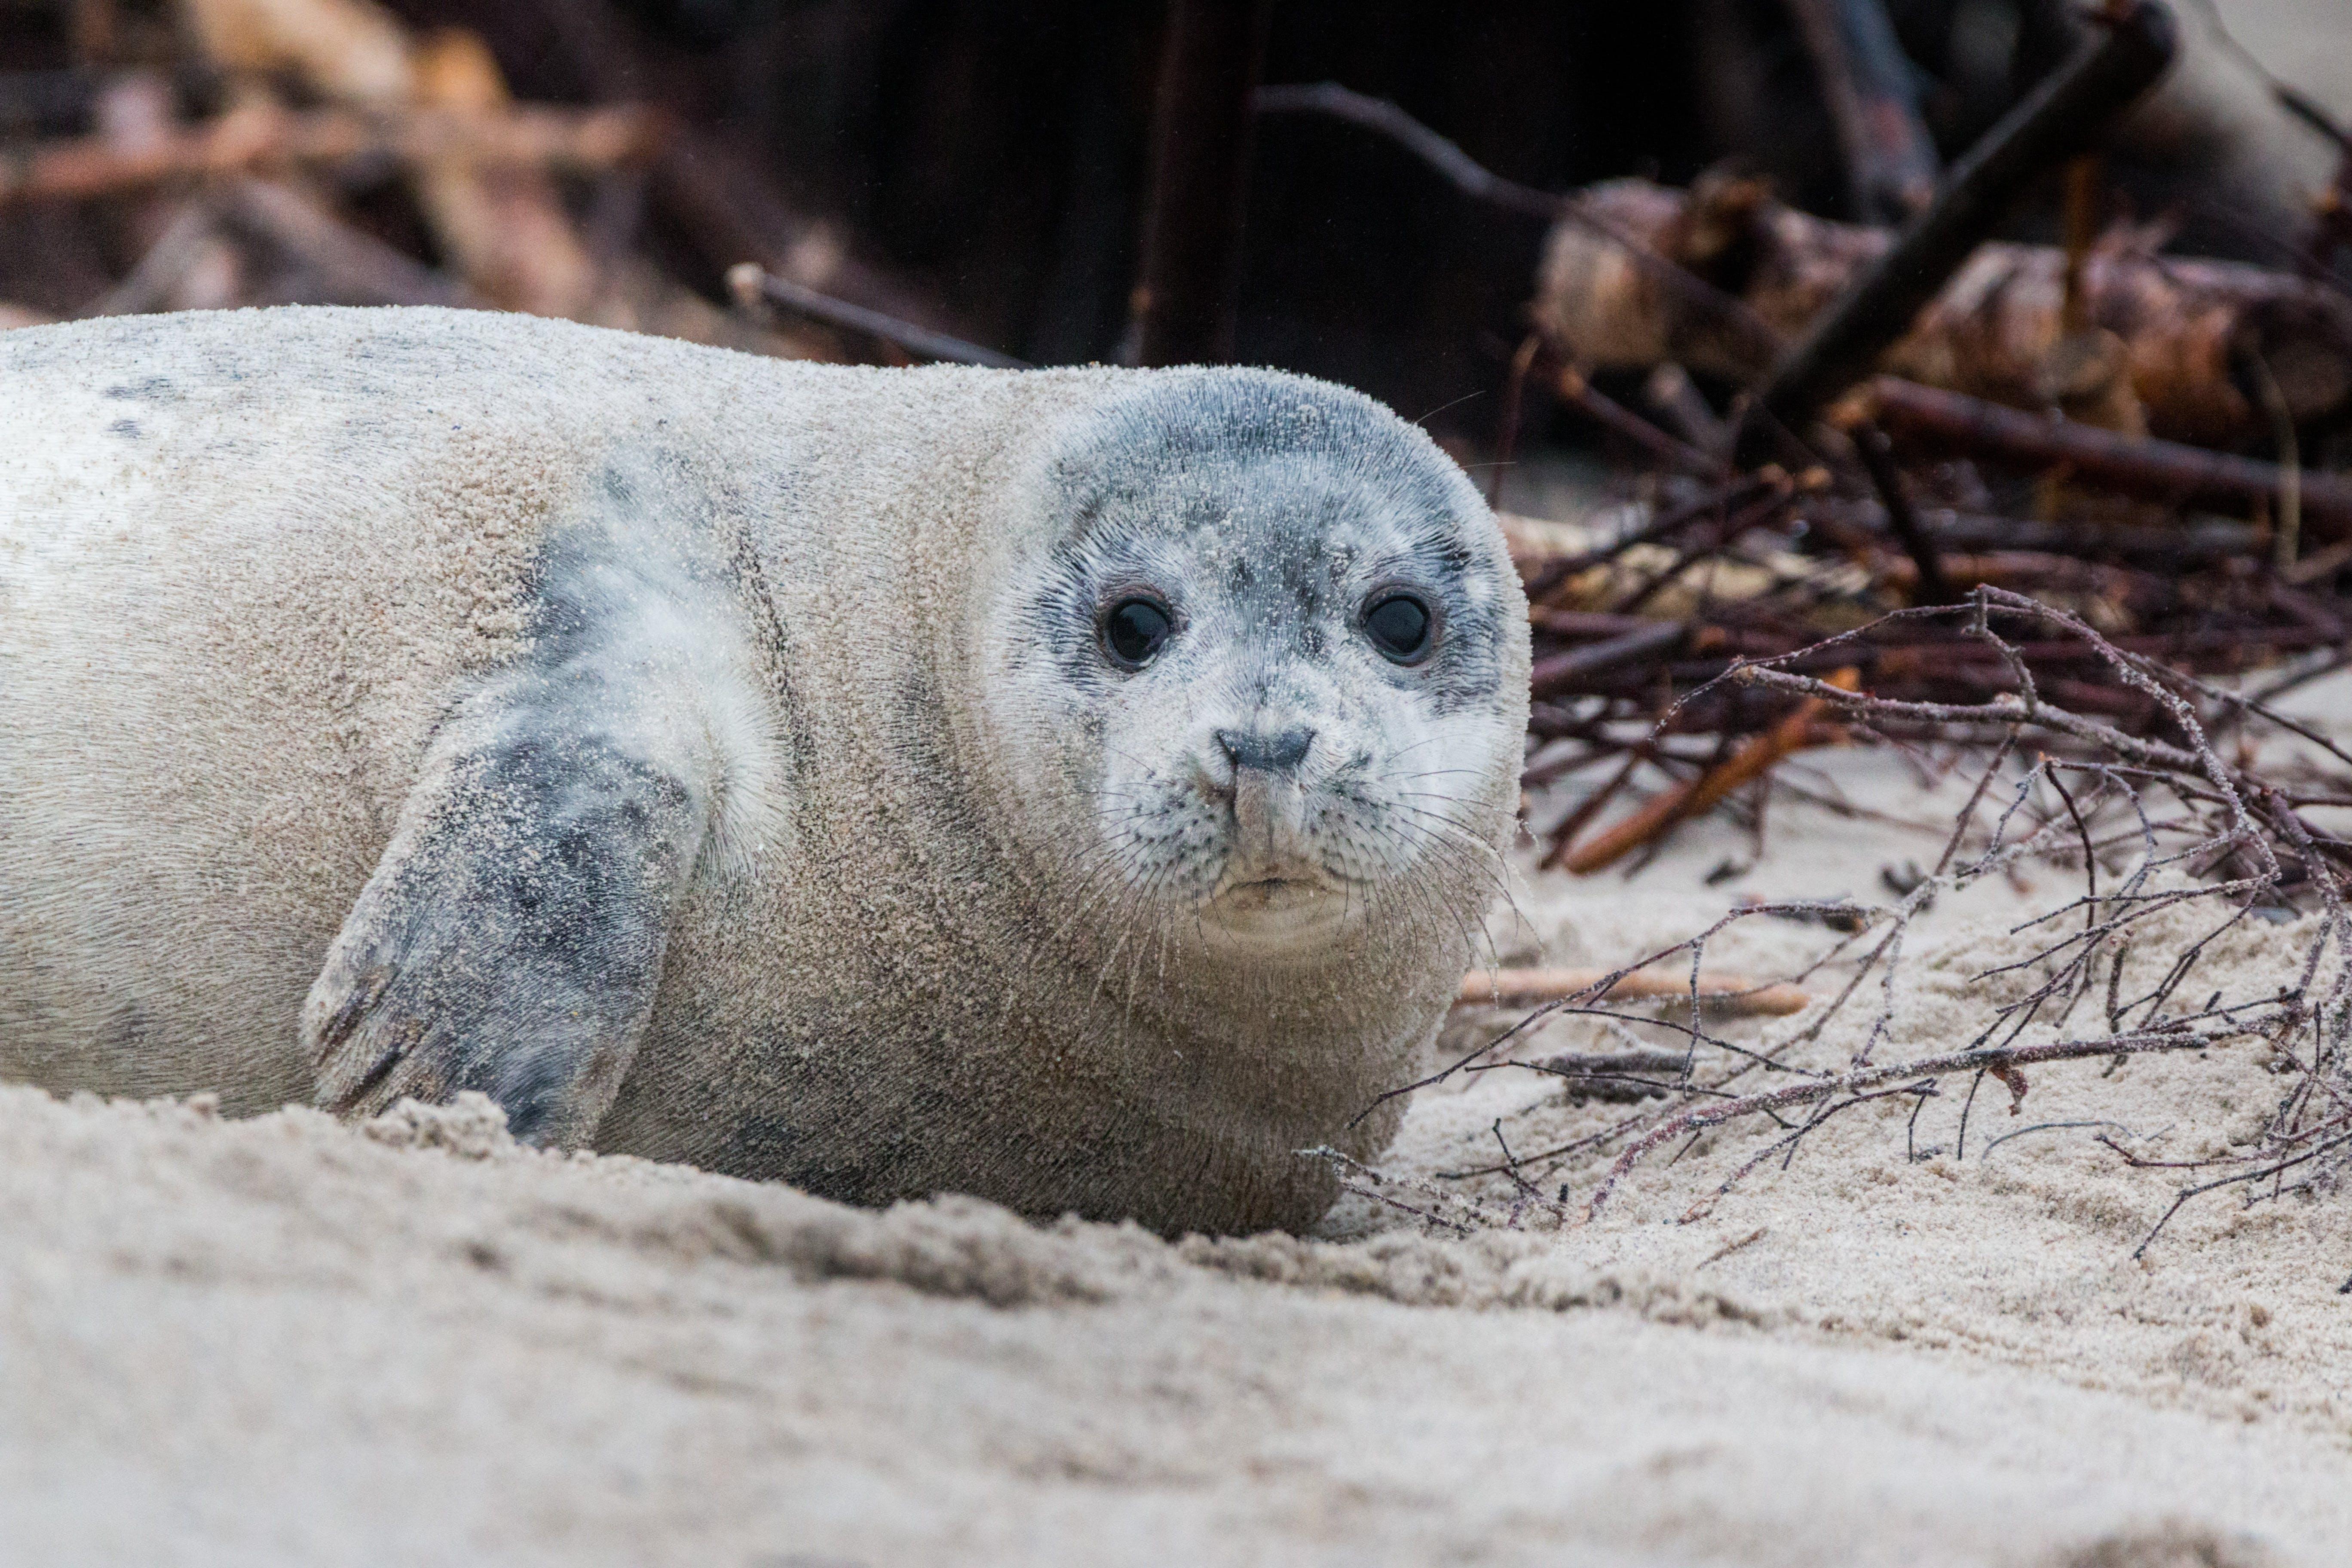 Gratis arkivbilde med dyr, dyrehage, dyreliv, hav